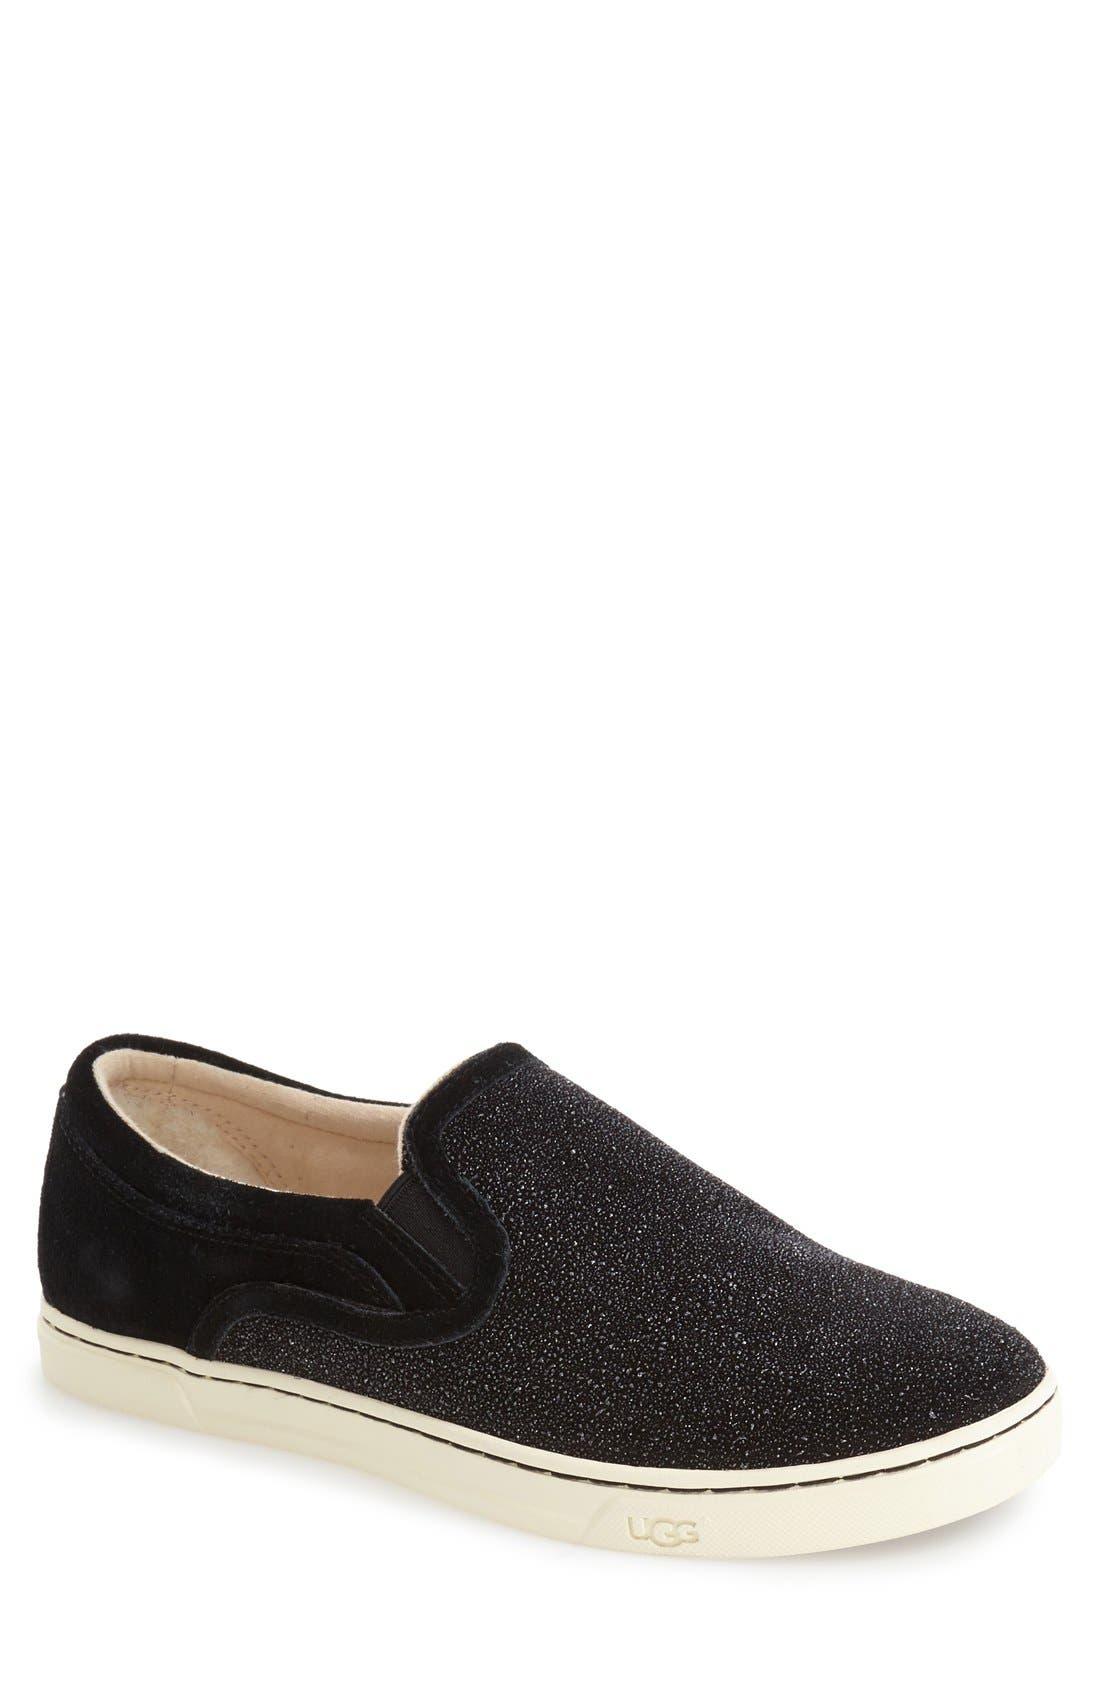 Fierce Slip-On Sneaker,                             Main thumbnail 1, color,                             Black Fabric